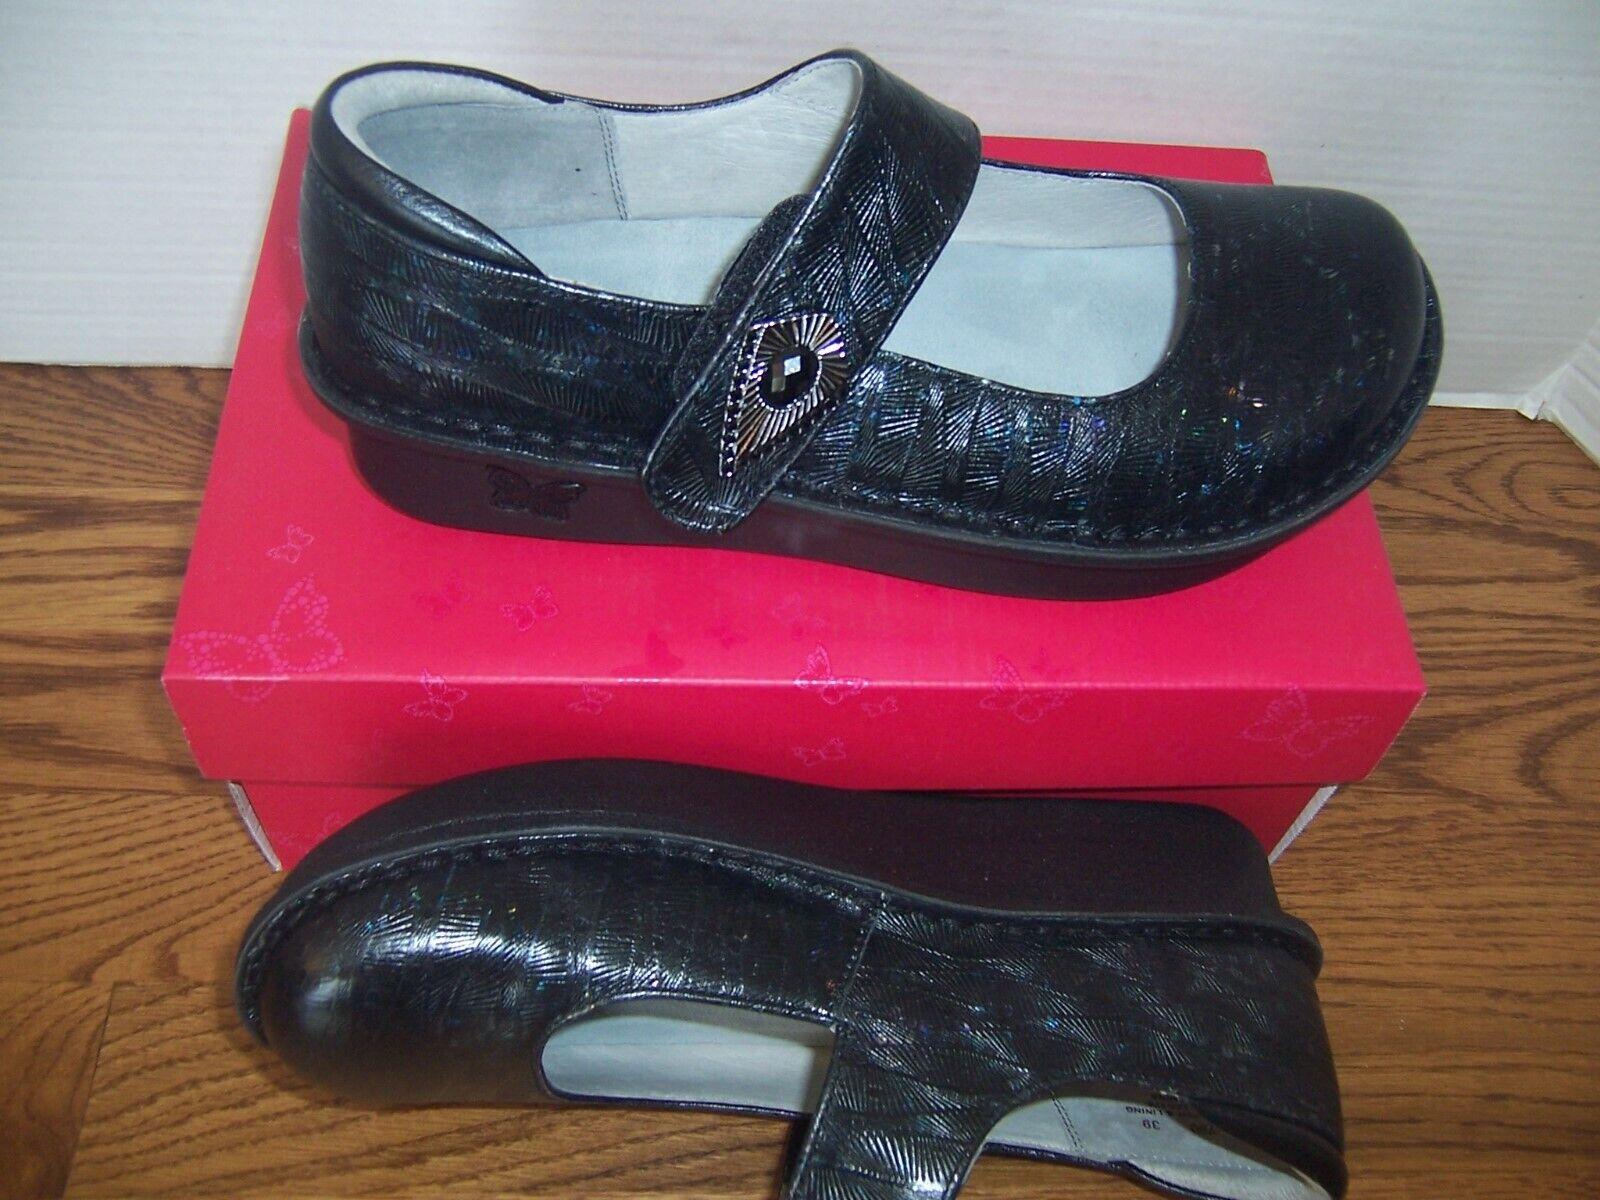 NEW ALEGRIA Paloma nero Rainbow Connection donna Mary Jane scarpe 38 US 8M